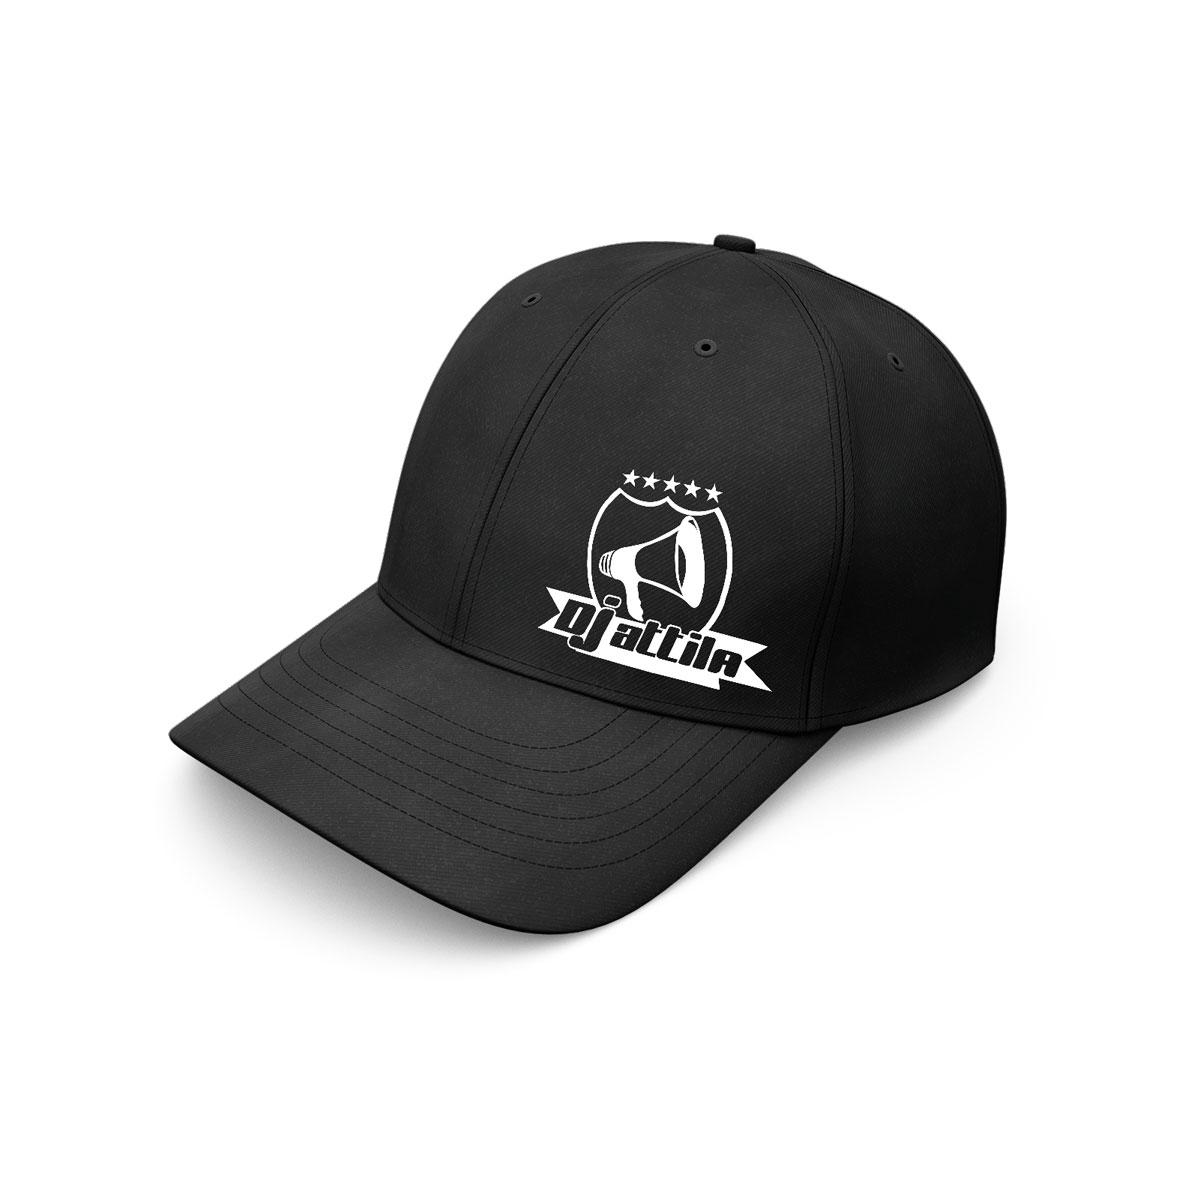 baseball cap dj attila logo schwarz